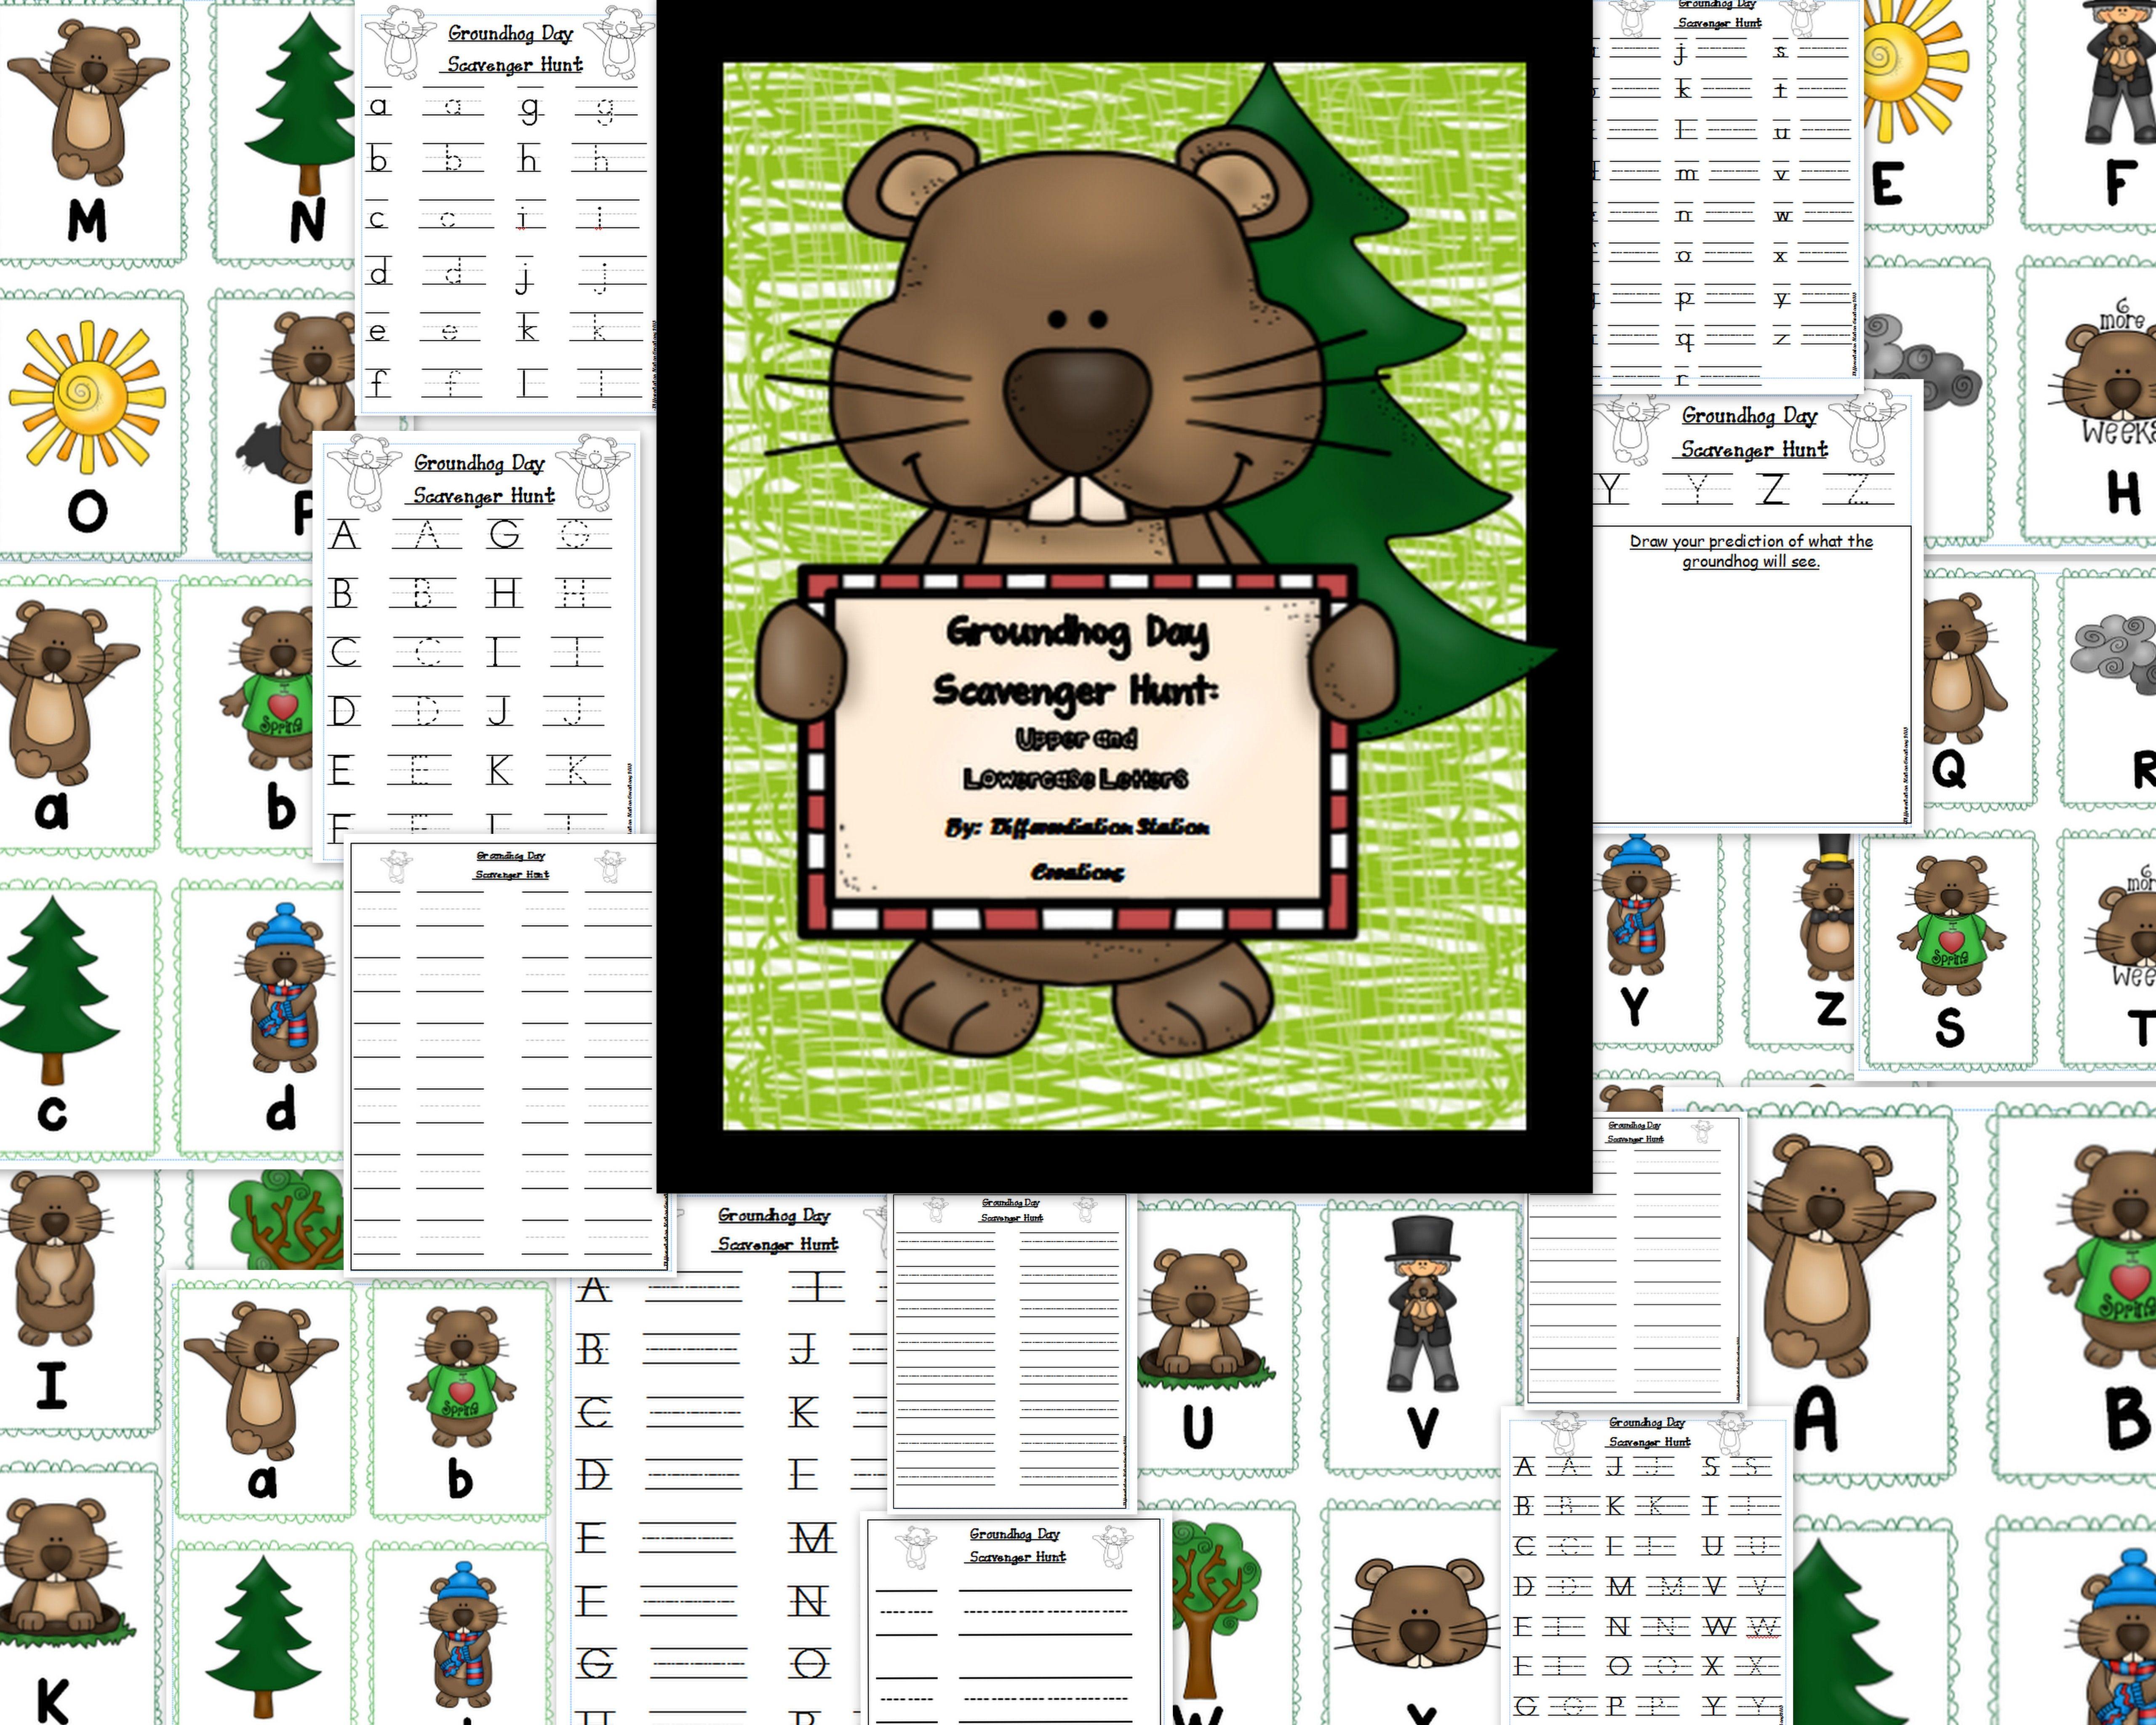 Groundhog Day Alphabet Scavenger Hunt Upper And Lowercase